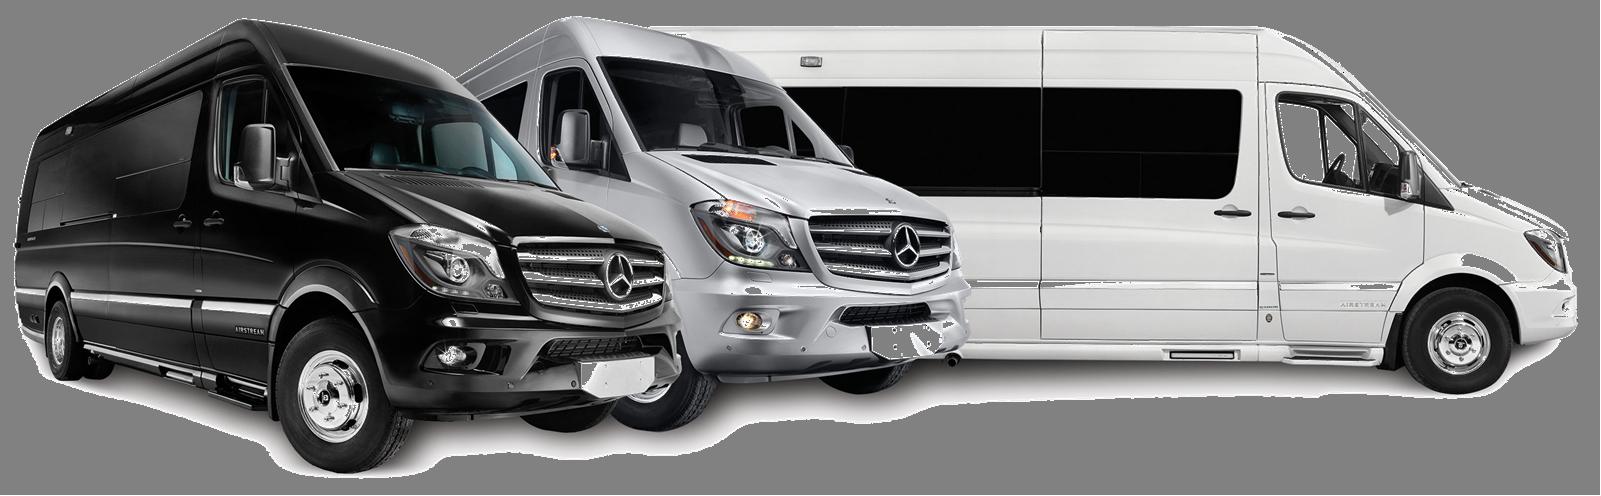 Mercedes Benz Sprinter Png Images